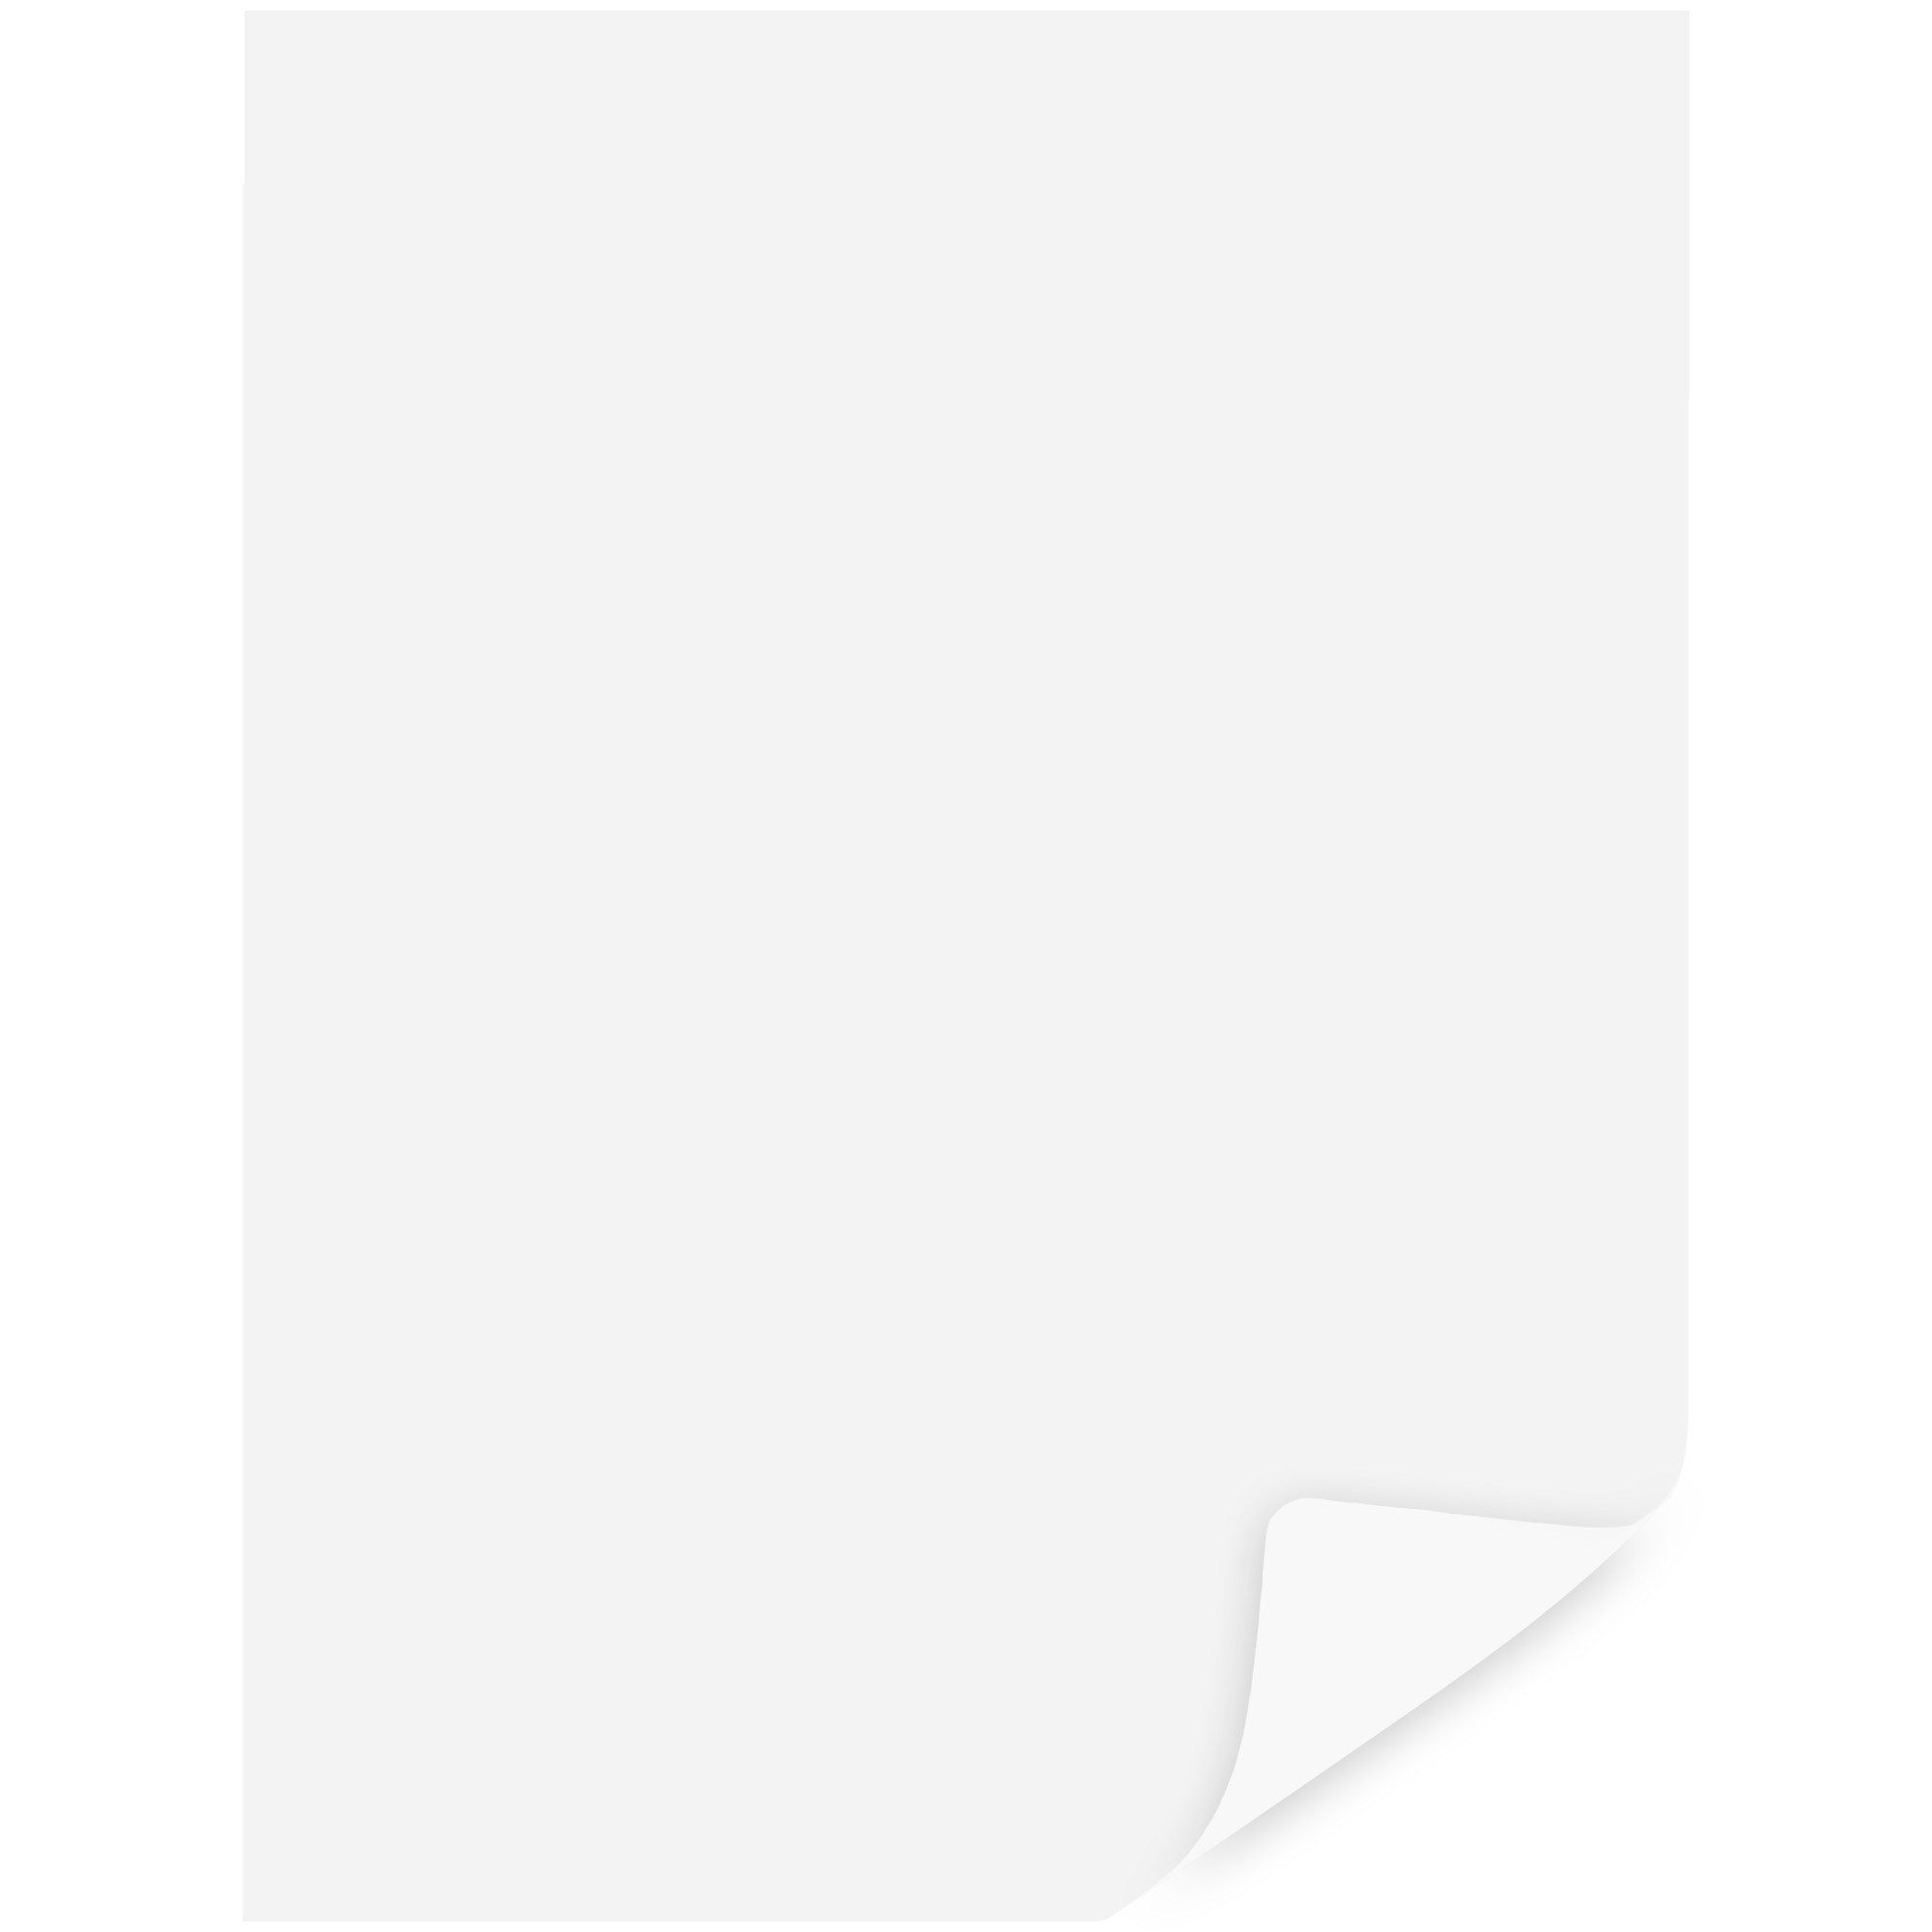 Papel Cartolina Branca Escolar 50X66CM 120G 6091268 - Multiverde